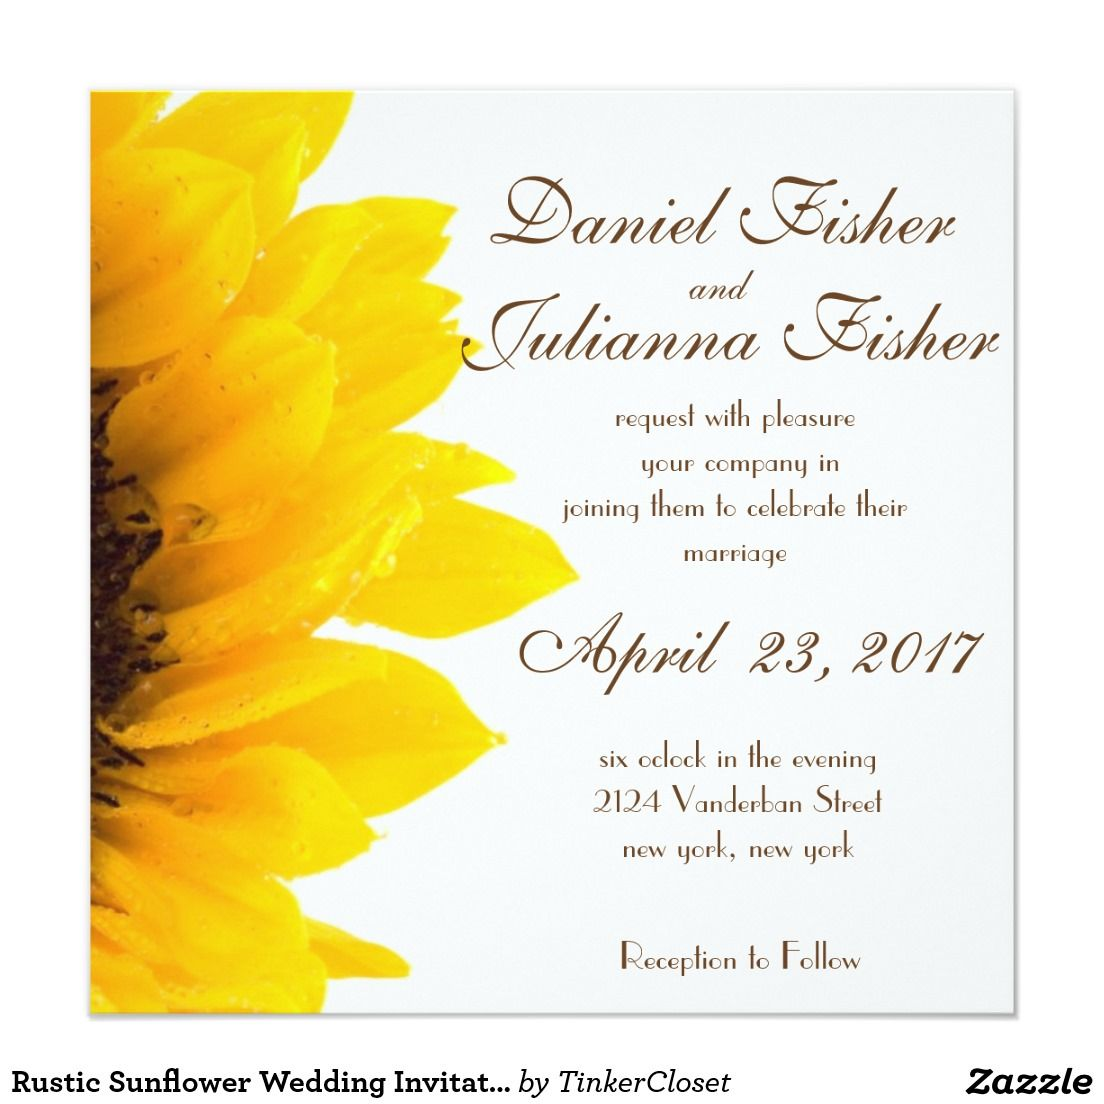 rustic sunflower wedding invitation rustic wedding invitations